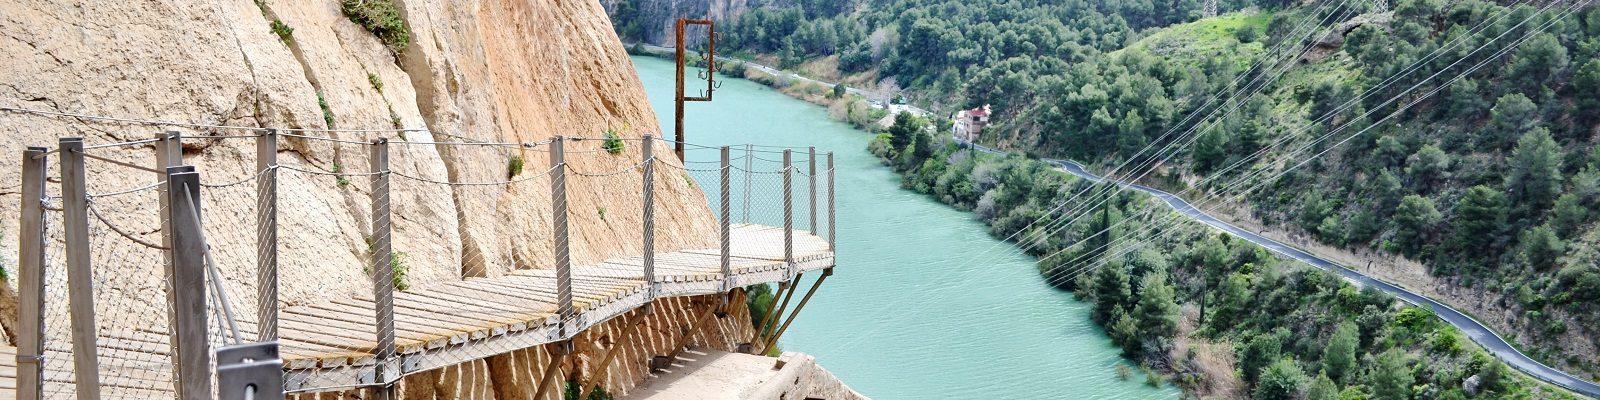 Caminito del Rey, printre cele mai spectaculoase drumuri din lume